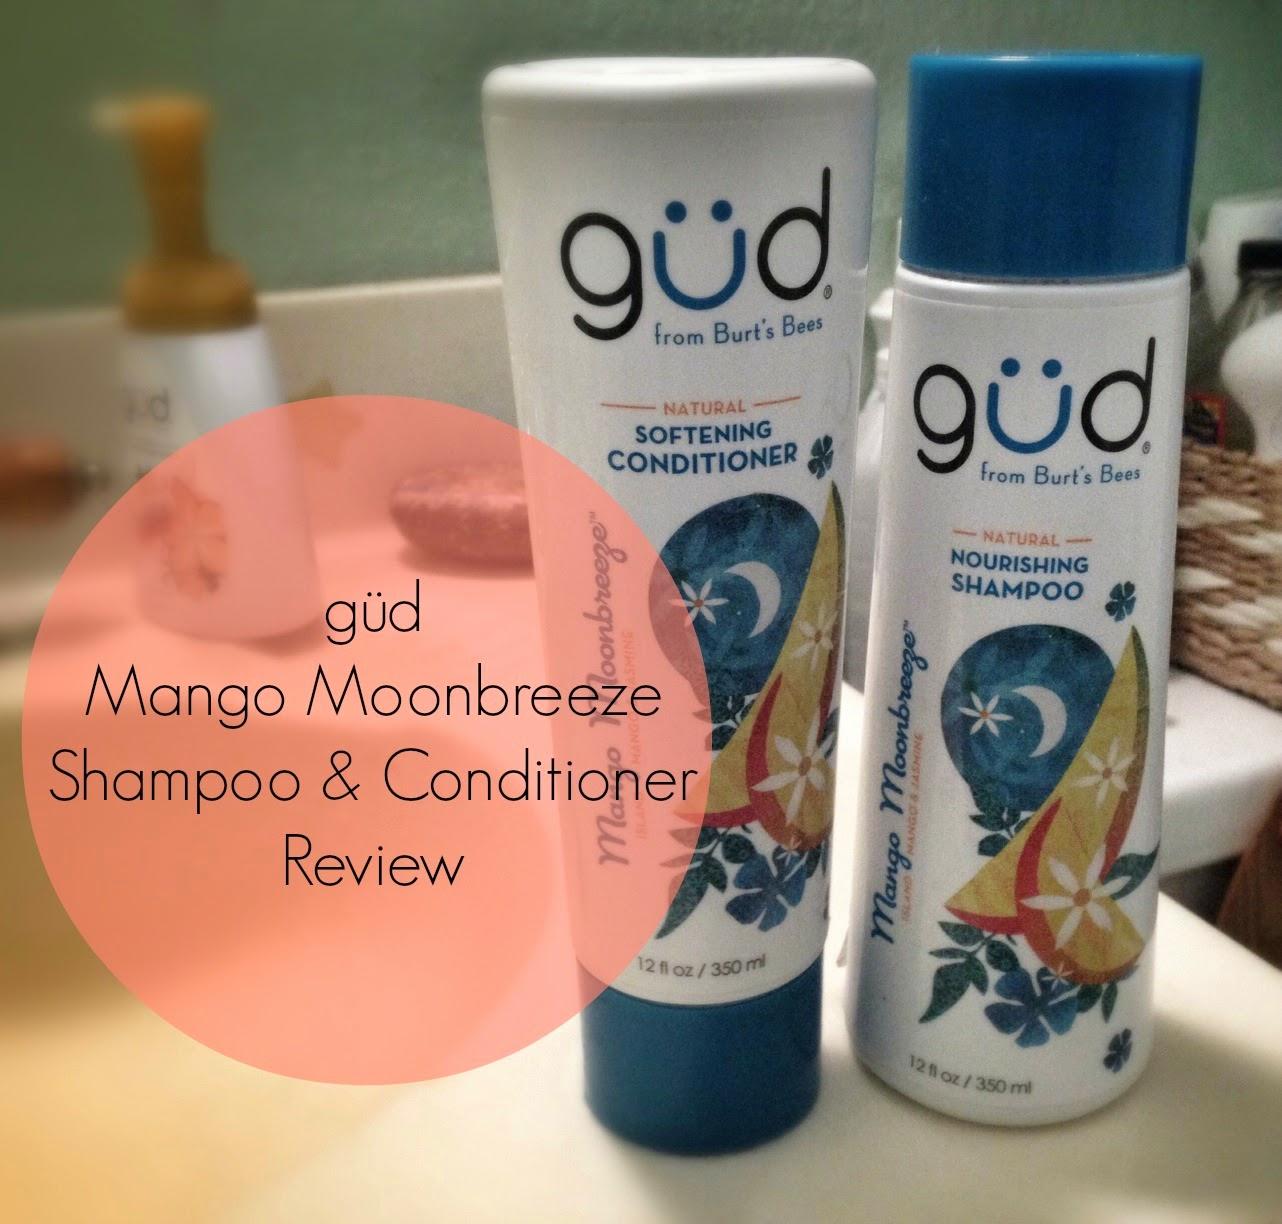 güd Mango Moonbreeze Shampoo & Conditioner